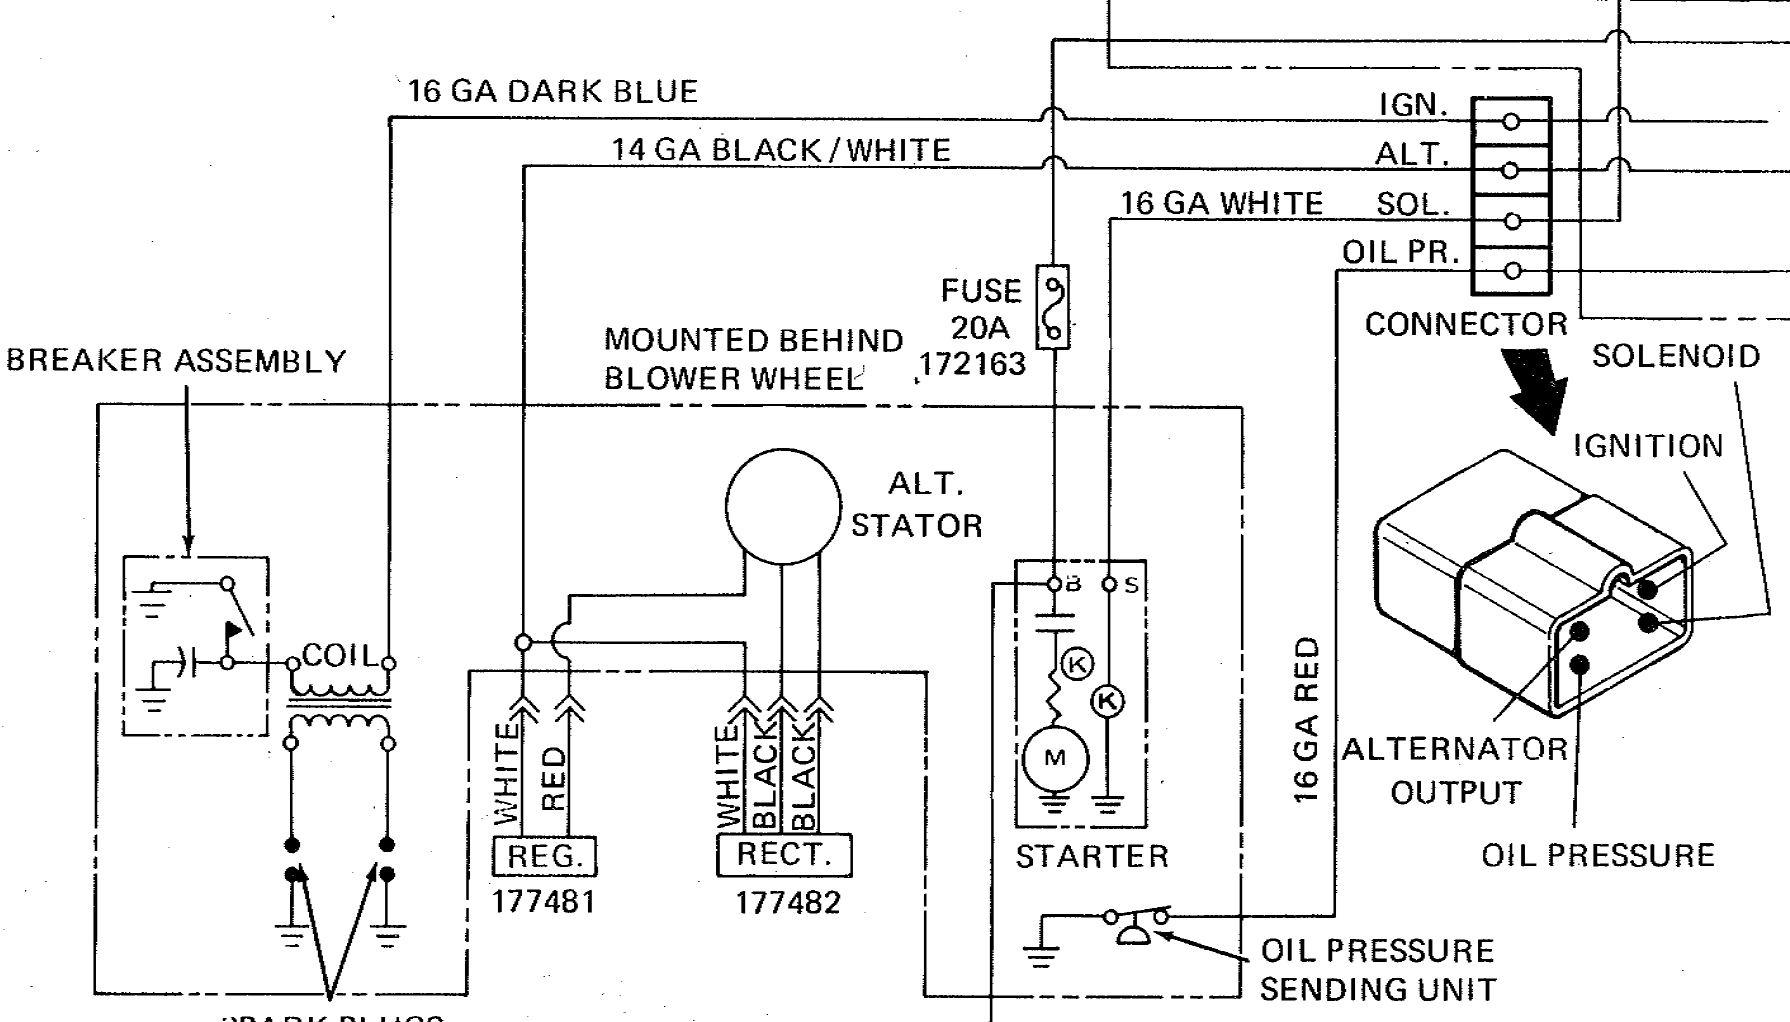 [DIAGRAM_3NM]  DIAGRAM] Ford 620 Wiring Diagram FULL Version HD Quality Wiring Diagram -  LADDERDIAGRAM.NUITDEBOUTAIX.FR | Ford 620 Wiring Diagram |  | ladderdiagram.nuitdeboutaix.fr